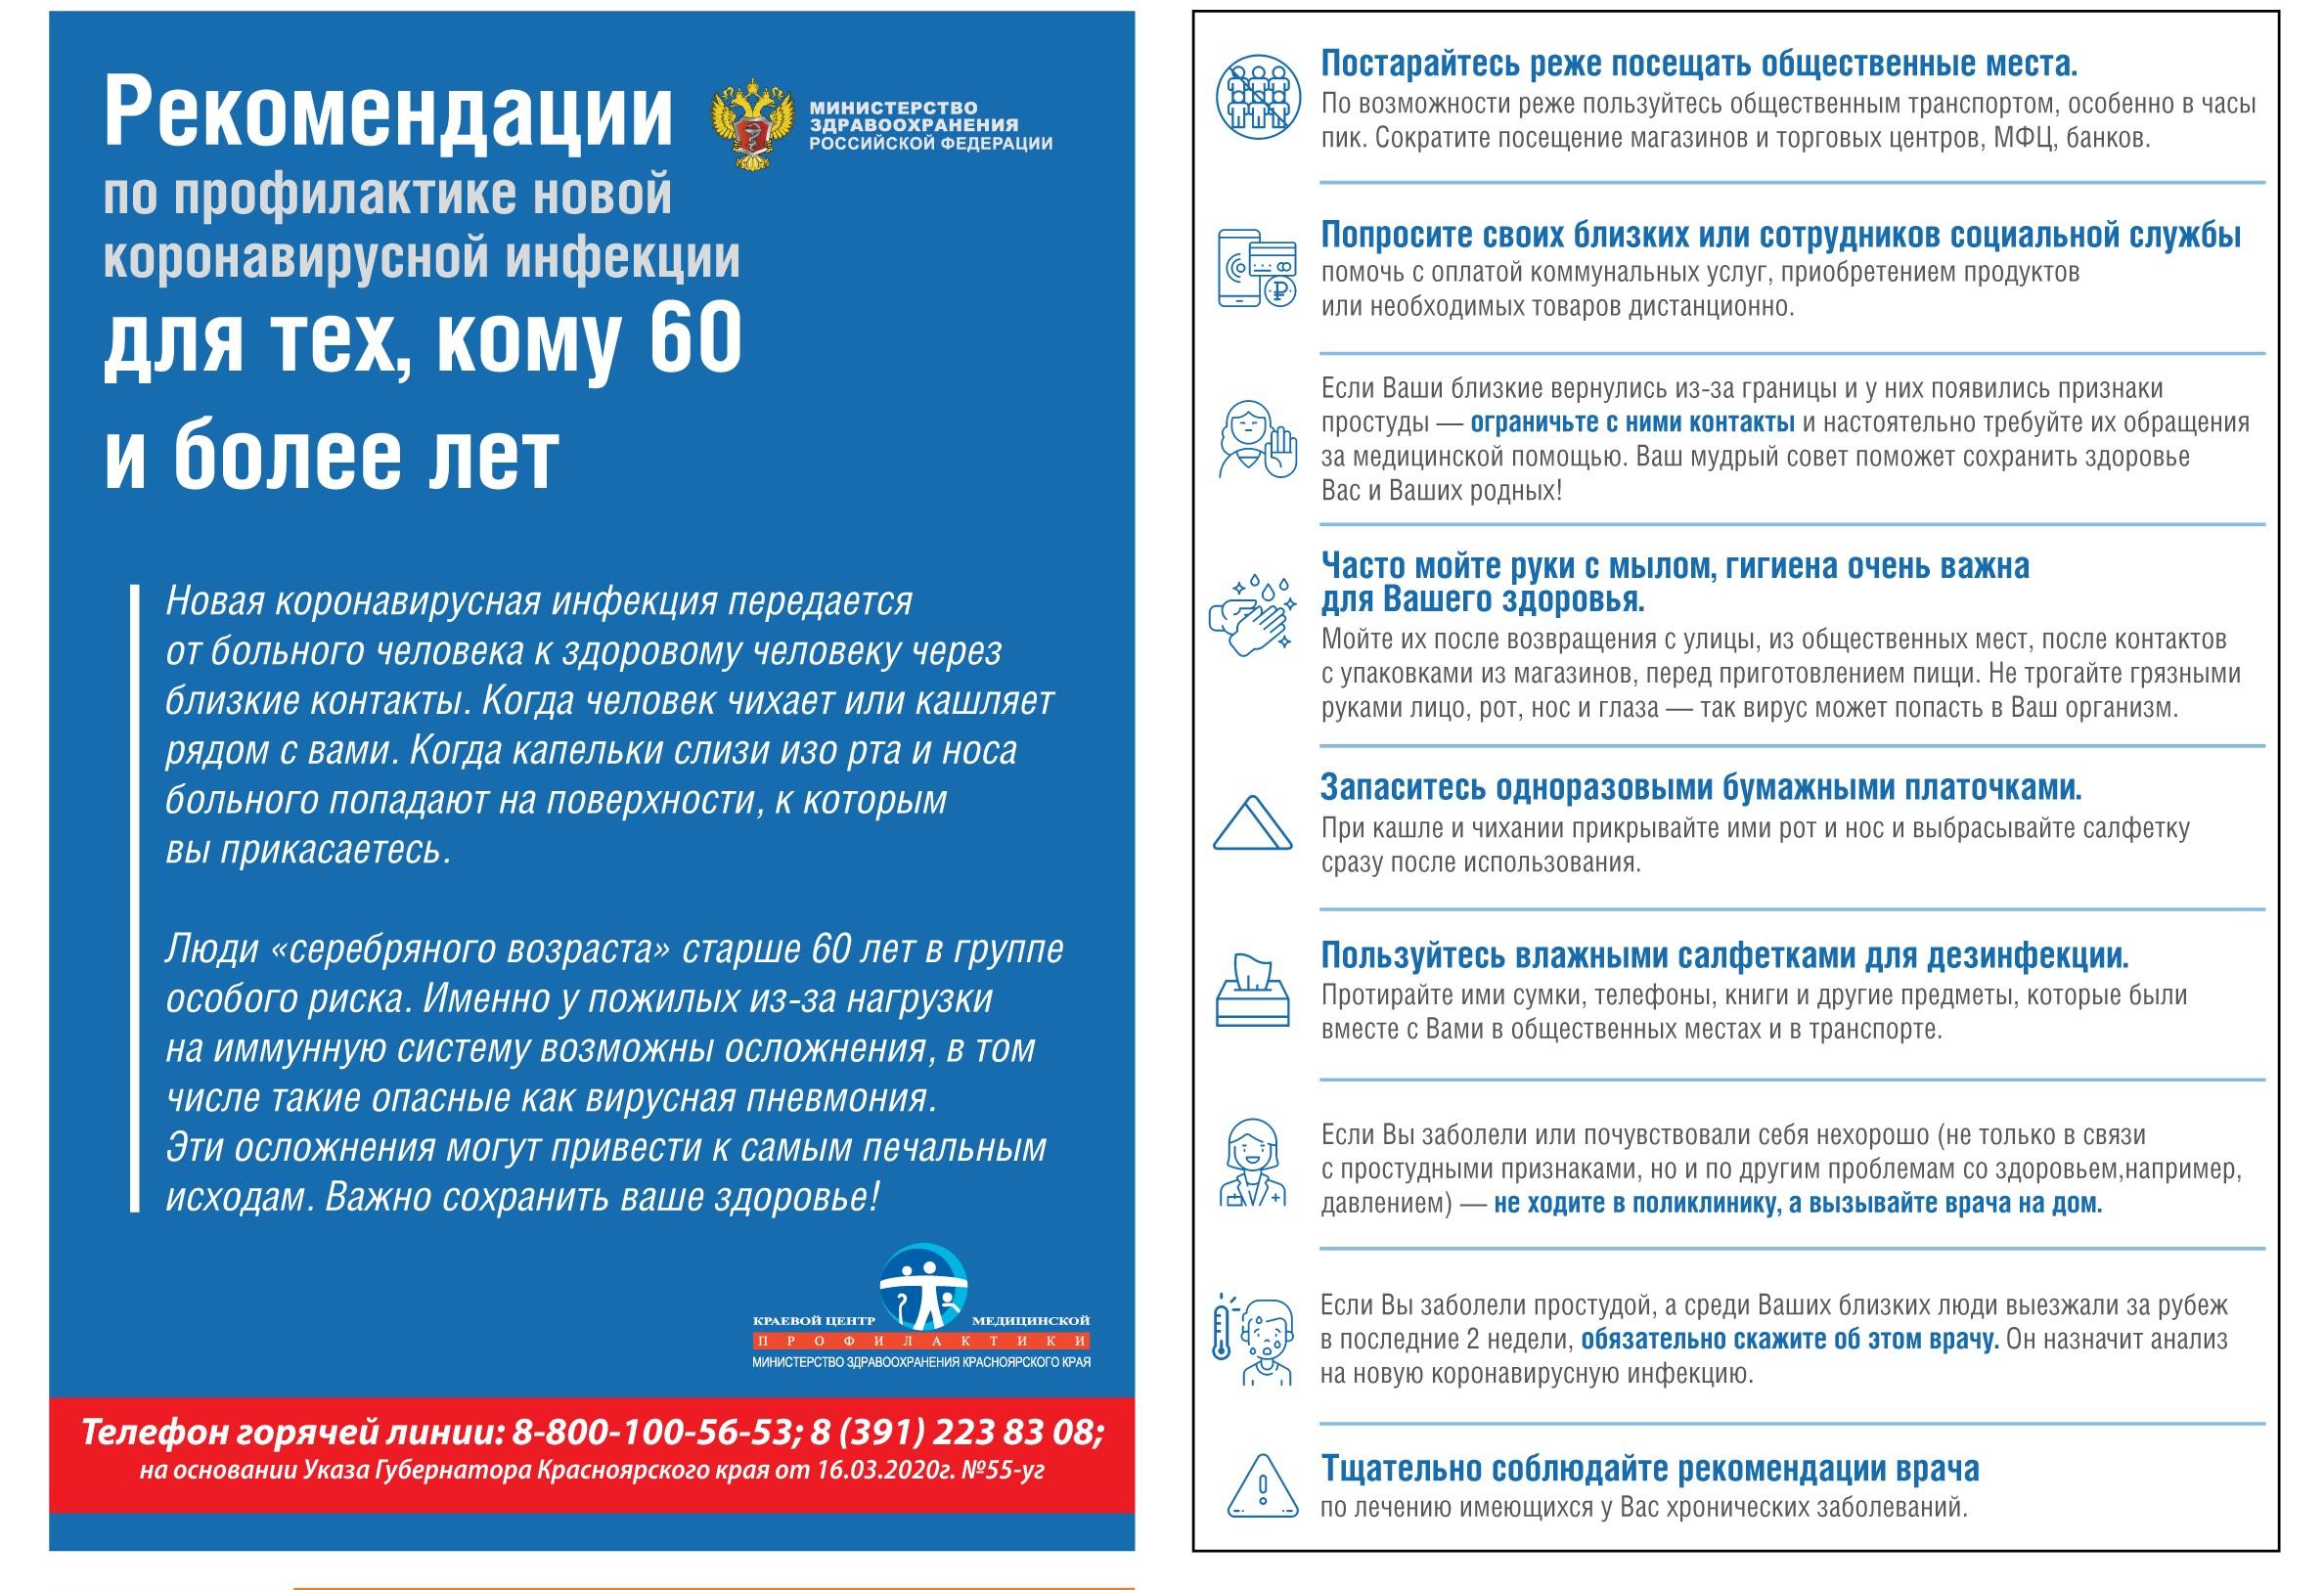 listovkadlya-pozhilyx-profilaktika-koronavirusa